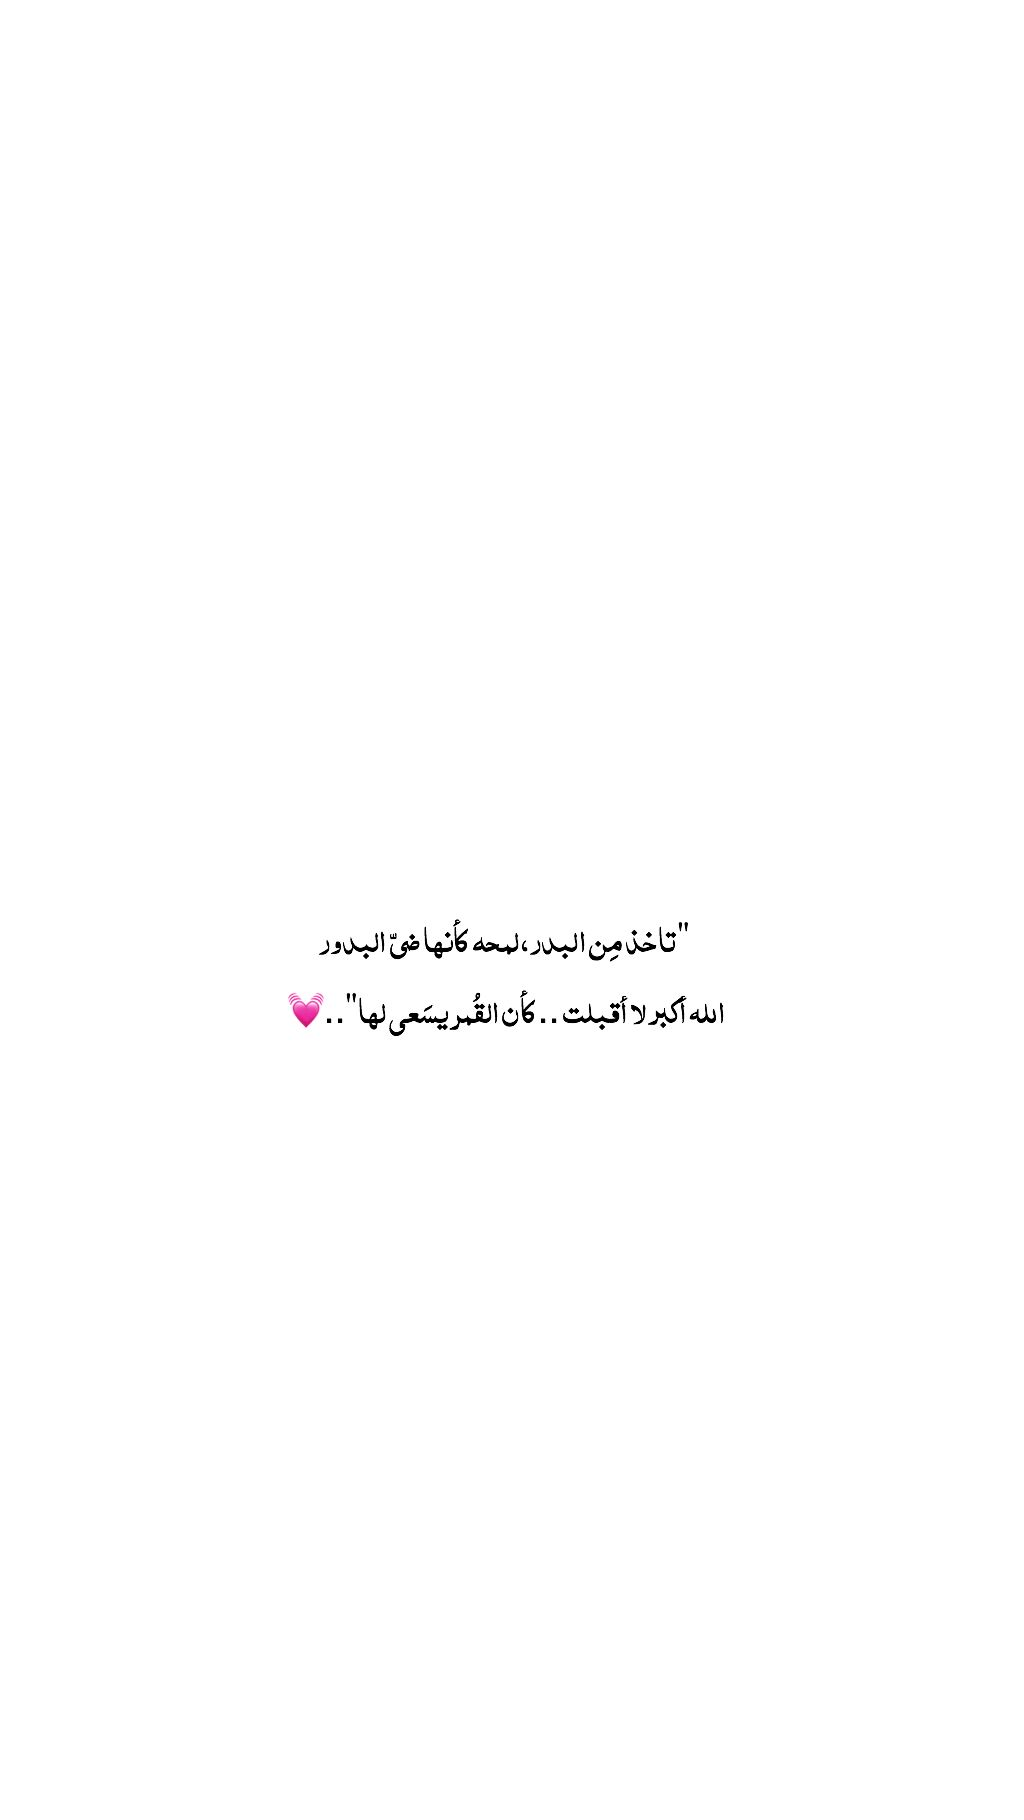 Twitter تويتر كلمات عبارات اقتباسات Words Quotes Romantic Words Beautiful Arabic Words Quotes Deep